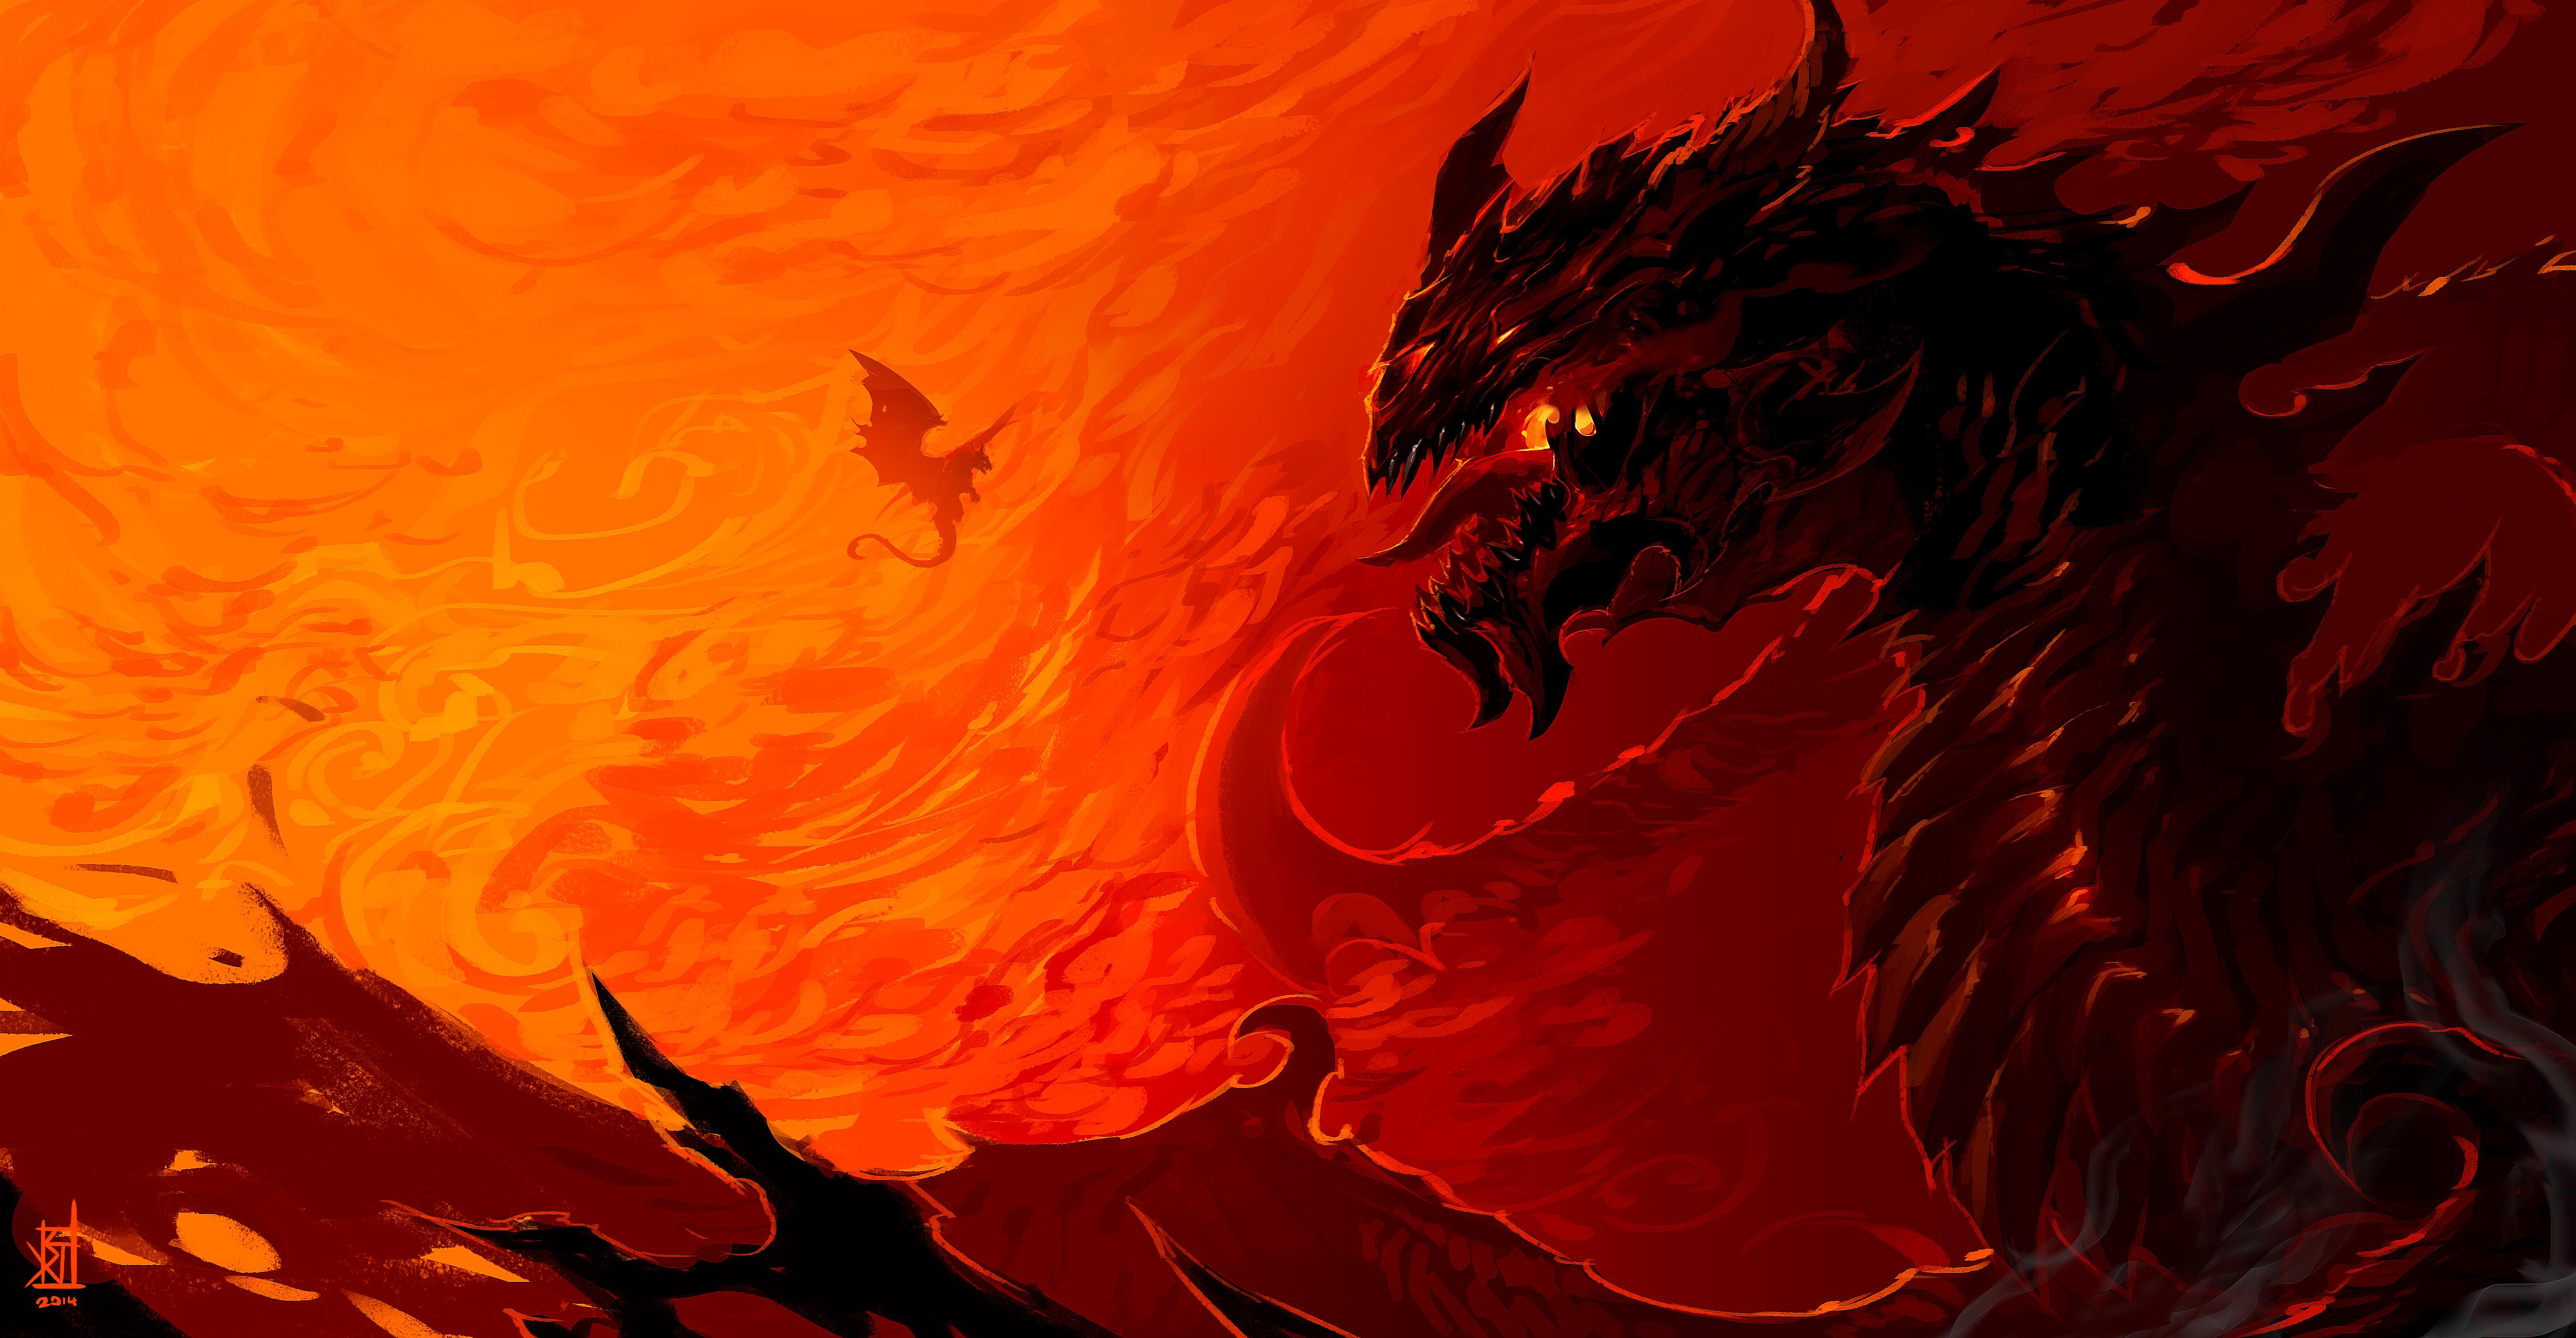 Dragon Red 4904x2547